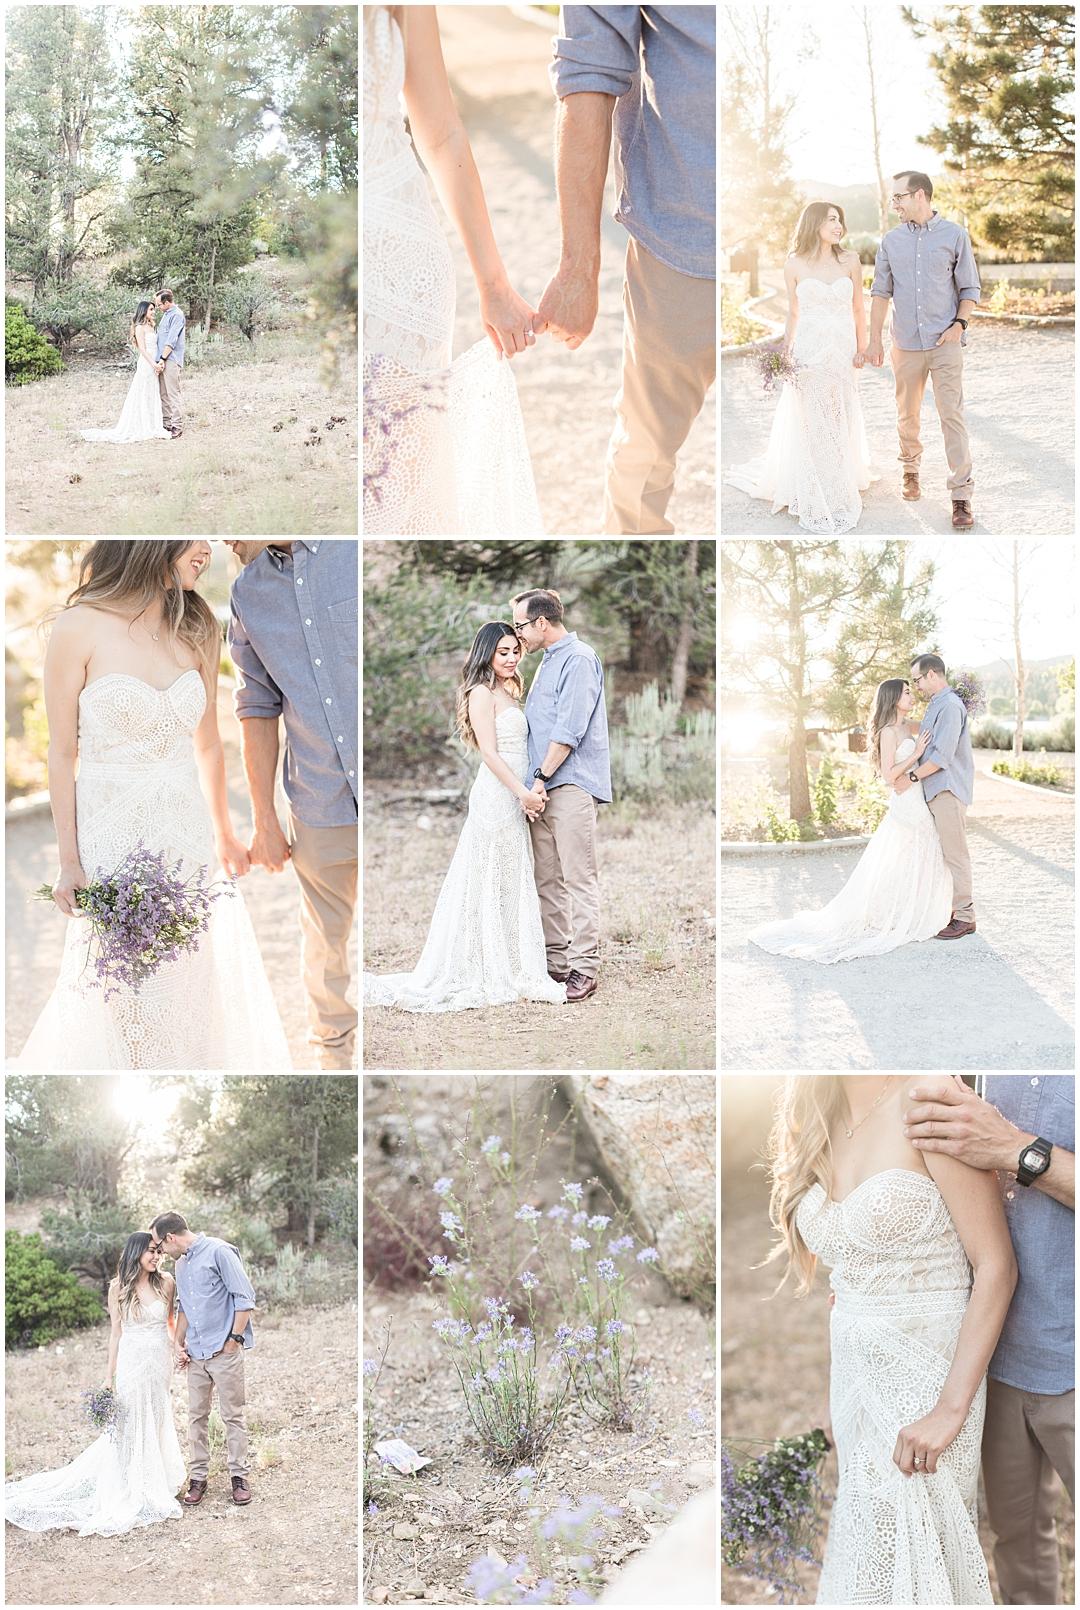 Romantic Big Bear engagement session, lavender wildflowers, Big Bear Lake Wedding Photographer, Carrie Vines Photography